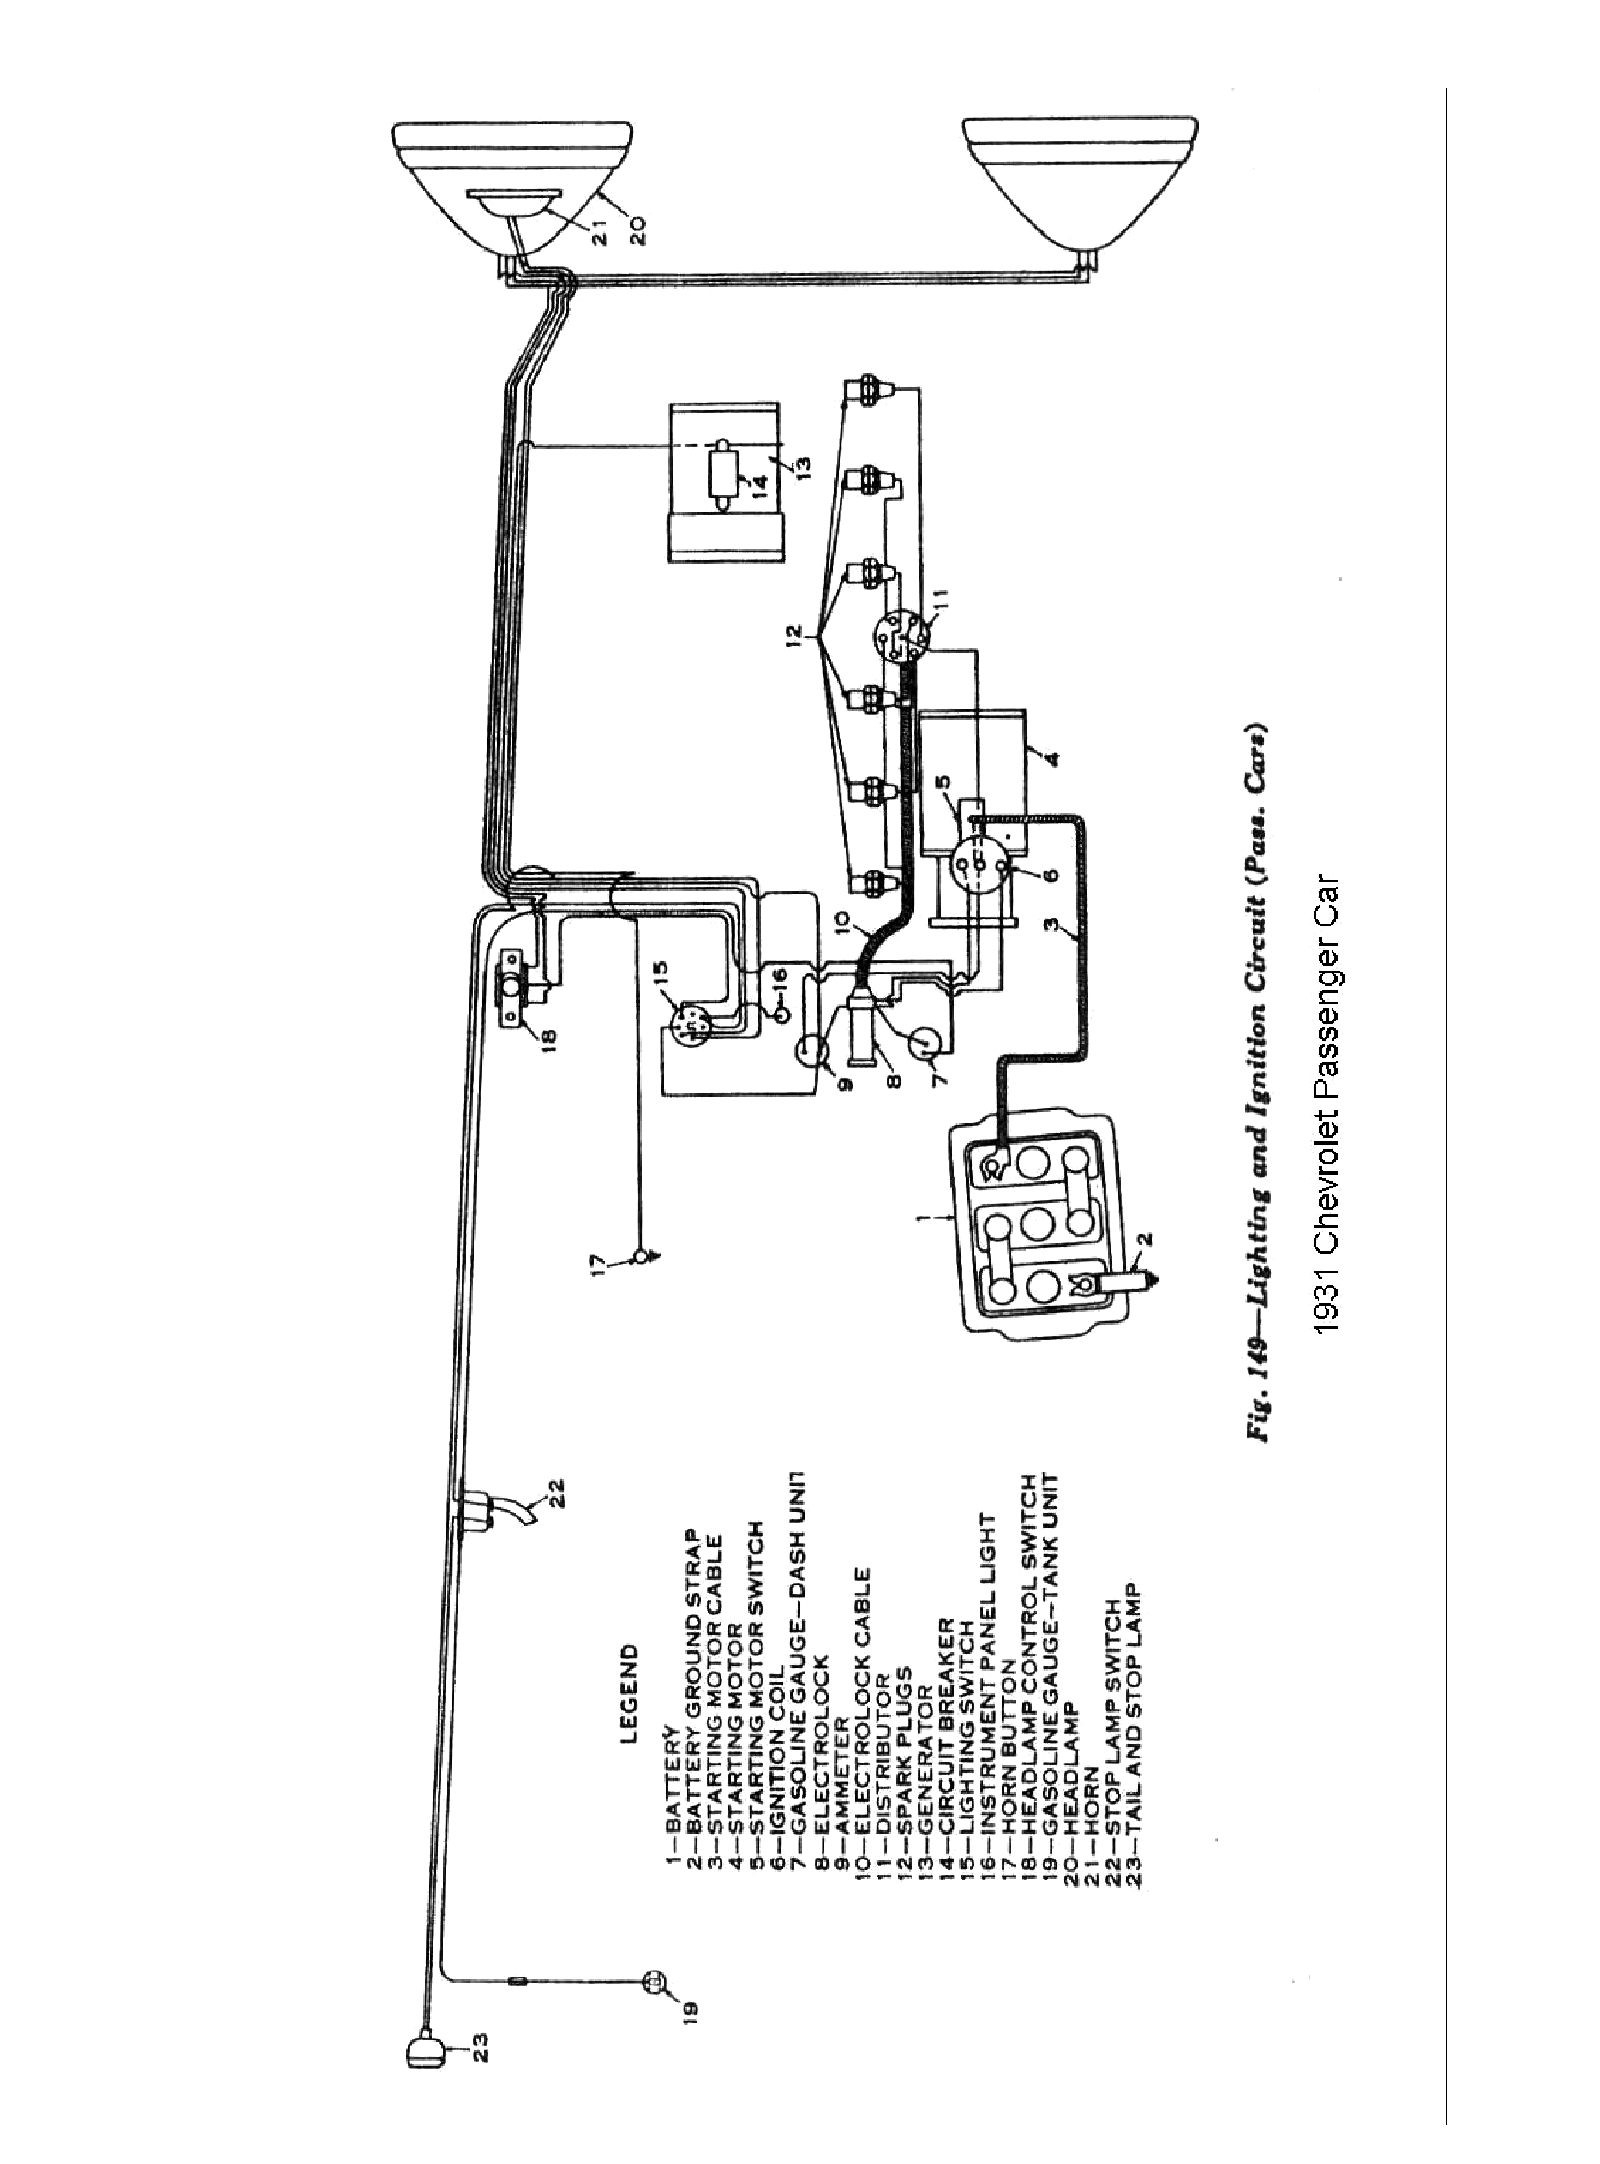 73 blazer fuel gauge wiring diagram wiring library. Black Bedroom Furniture Sets. Home Design Ideas